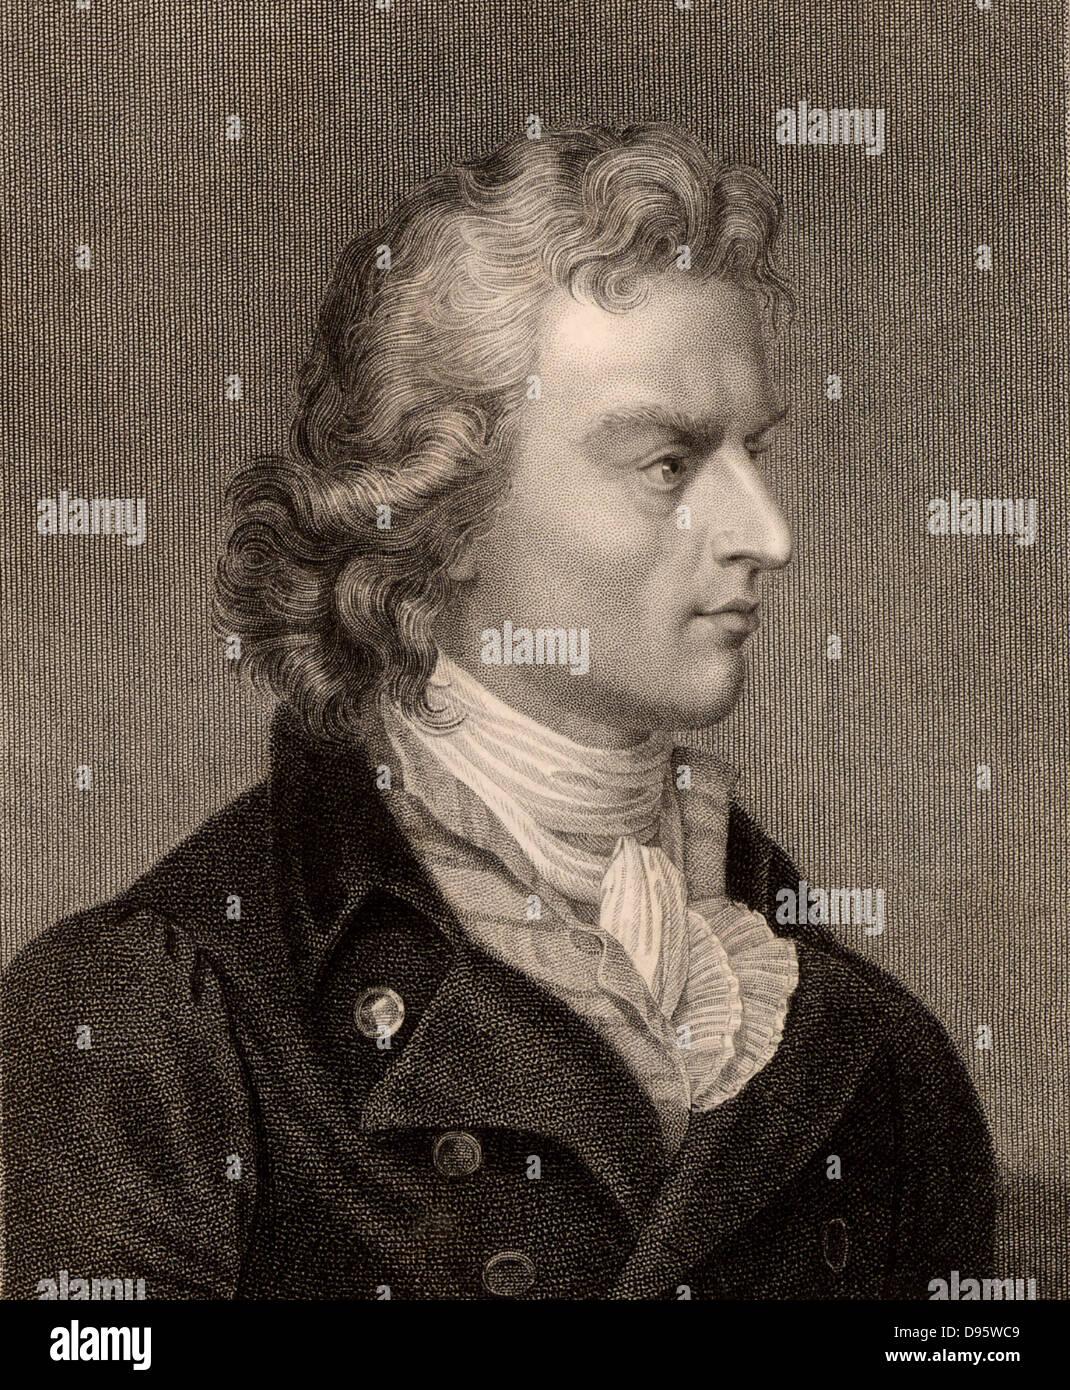 Johann Christoph Friedrich Schiller (1759-1805) German poet, dramatist and historian, writer of 'Sturm and Drang' - Stock Image